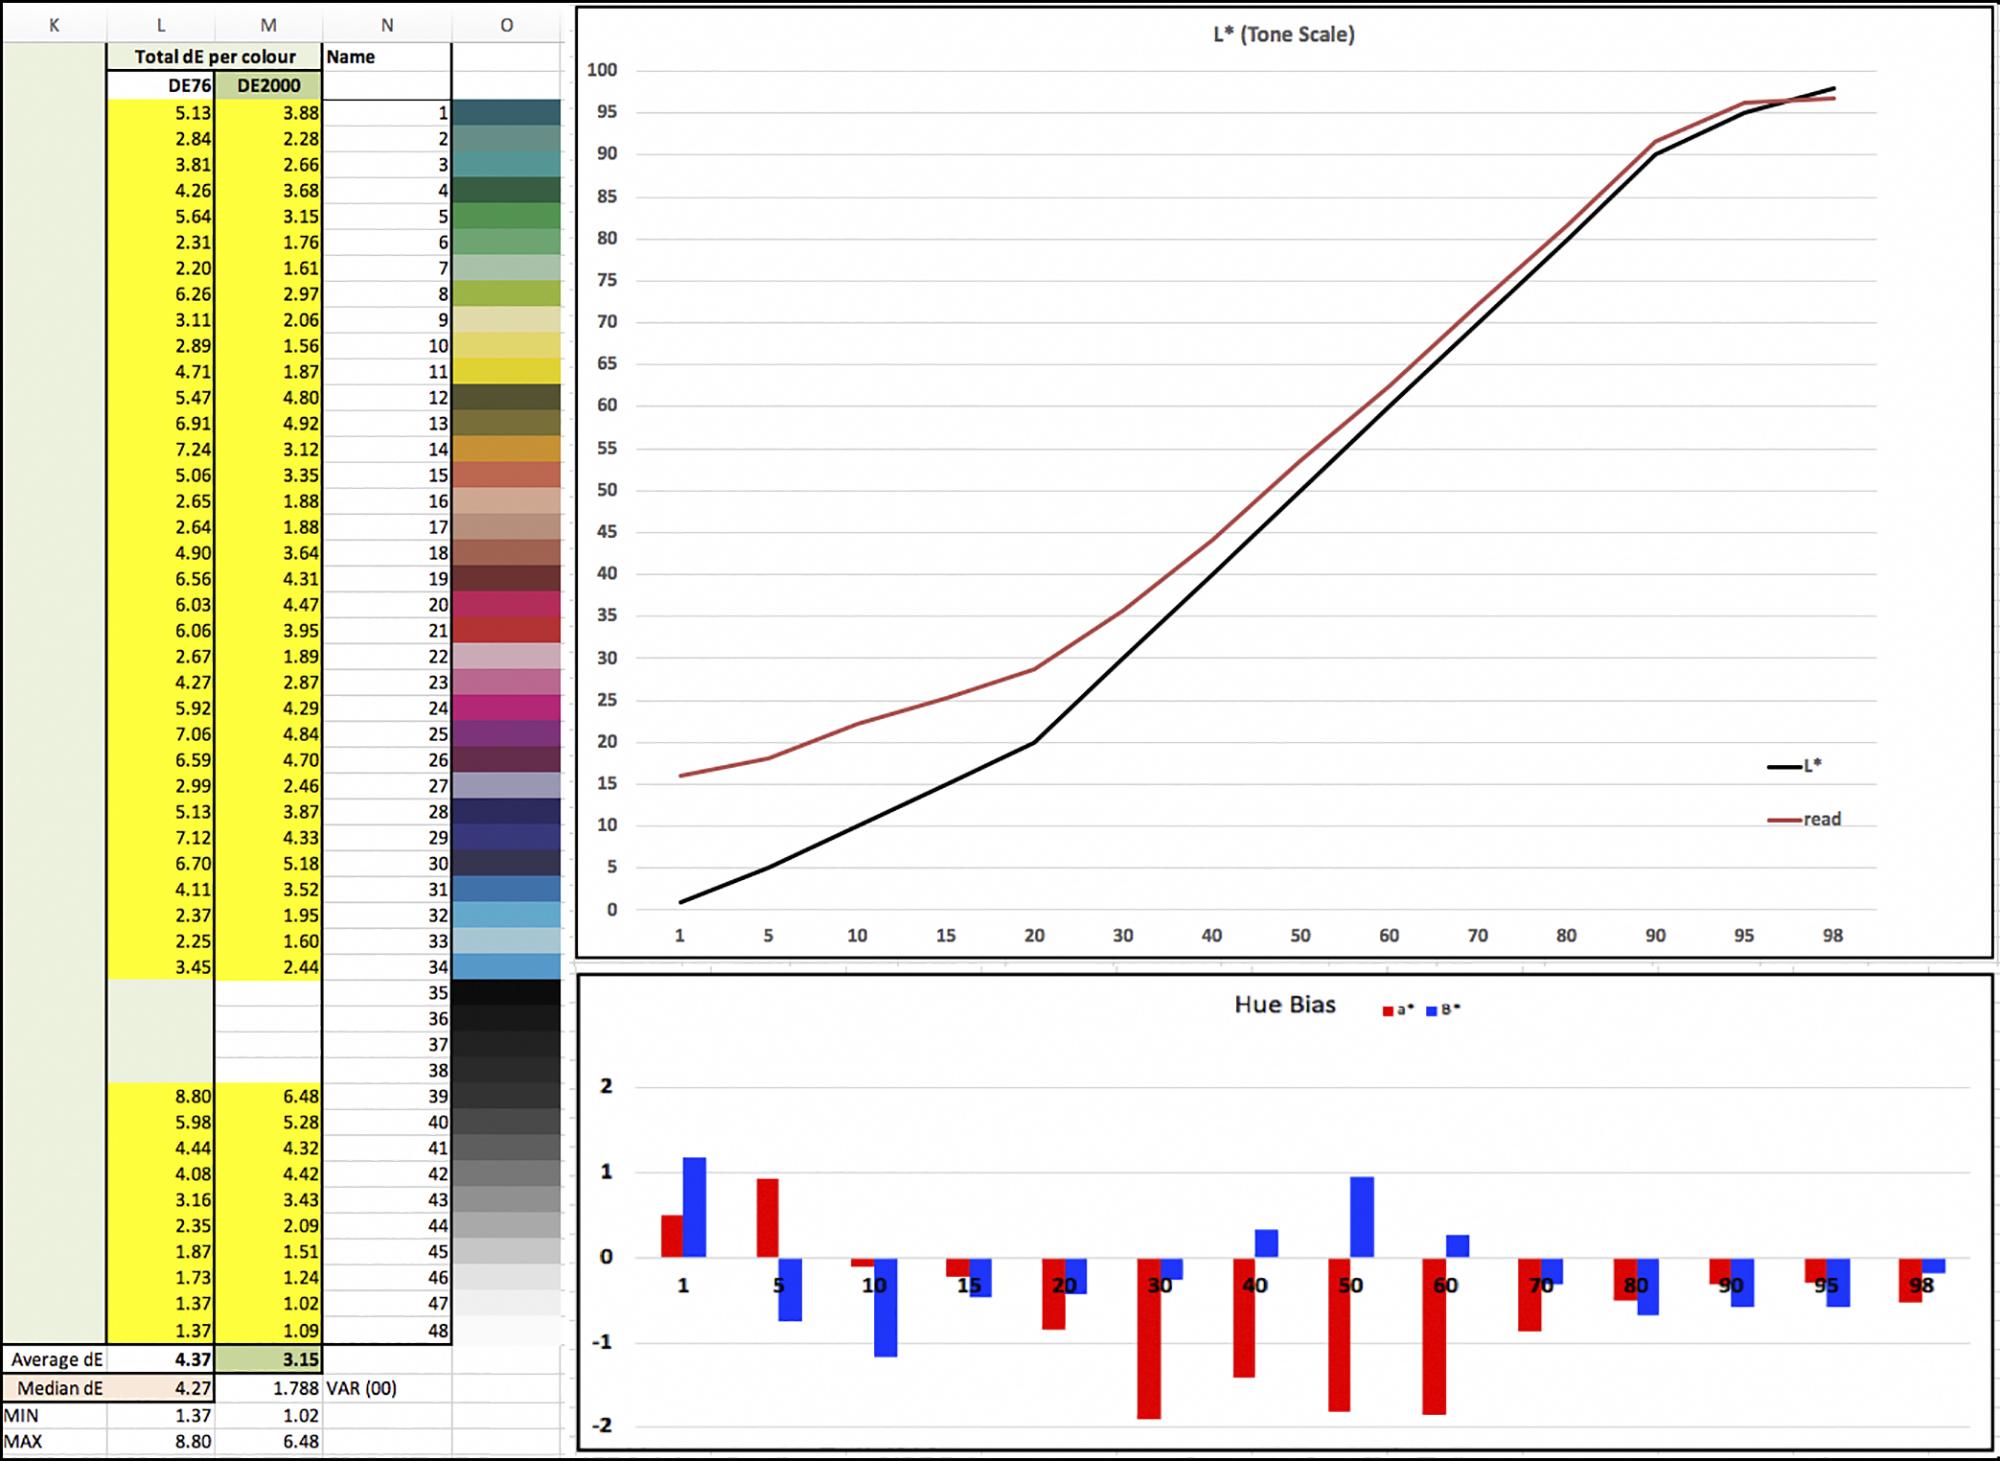 Figure 8. Results for Paper 88, Epson SC-P5000 printer, OEM Profile